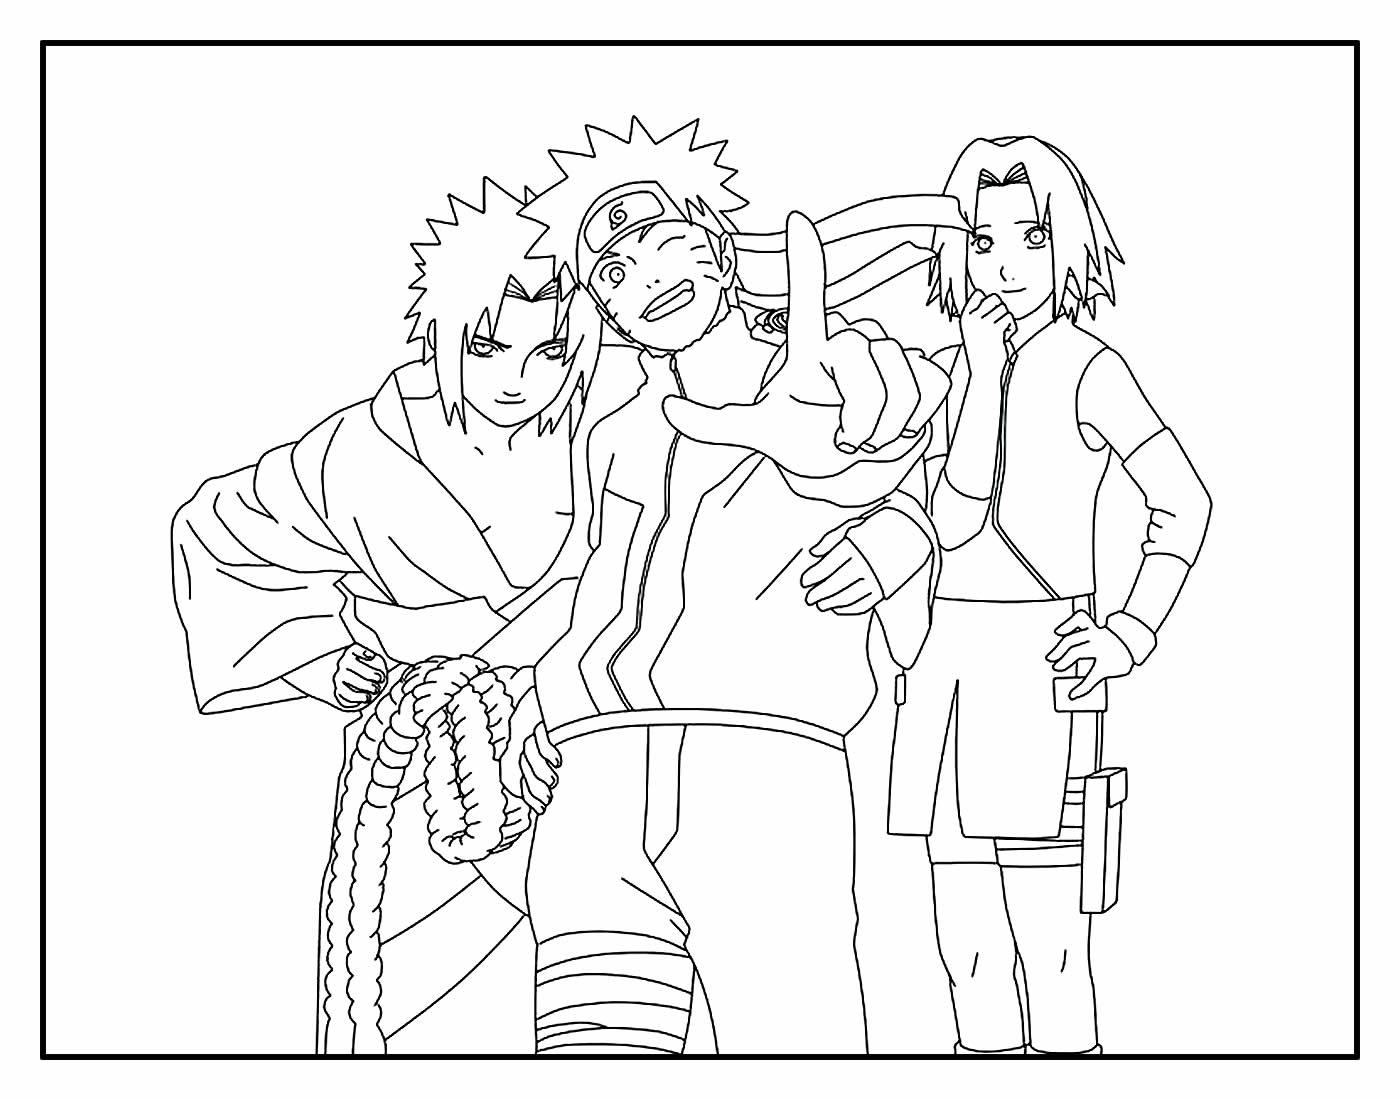 Lindos Desenhos para colorir de Naruto